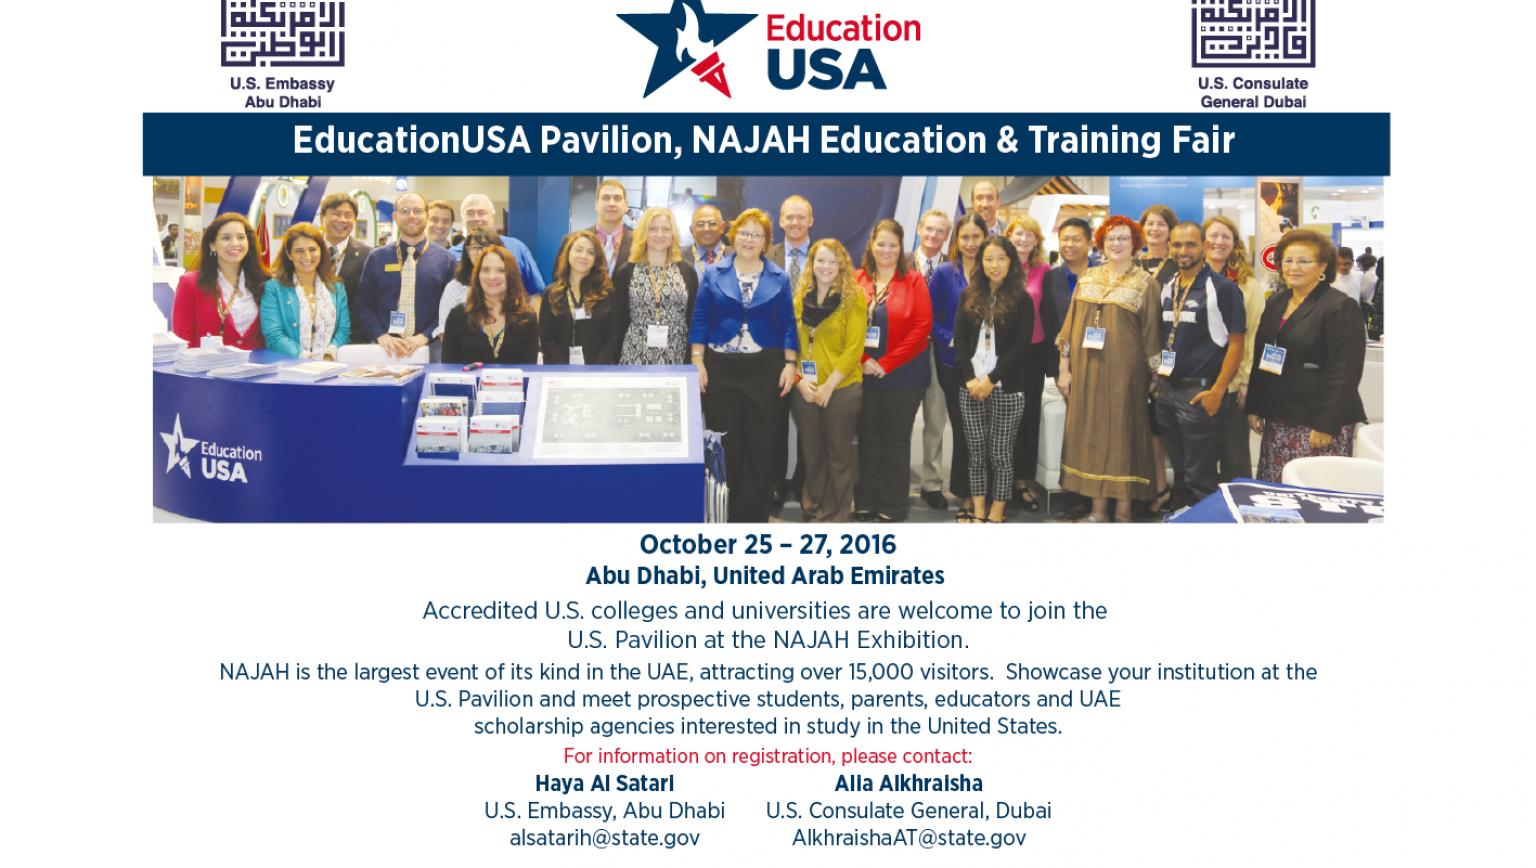 US Consulate General Dubai EducationUSA - Map us embassy abu dhabi